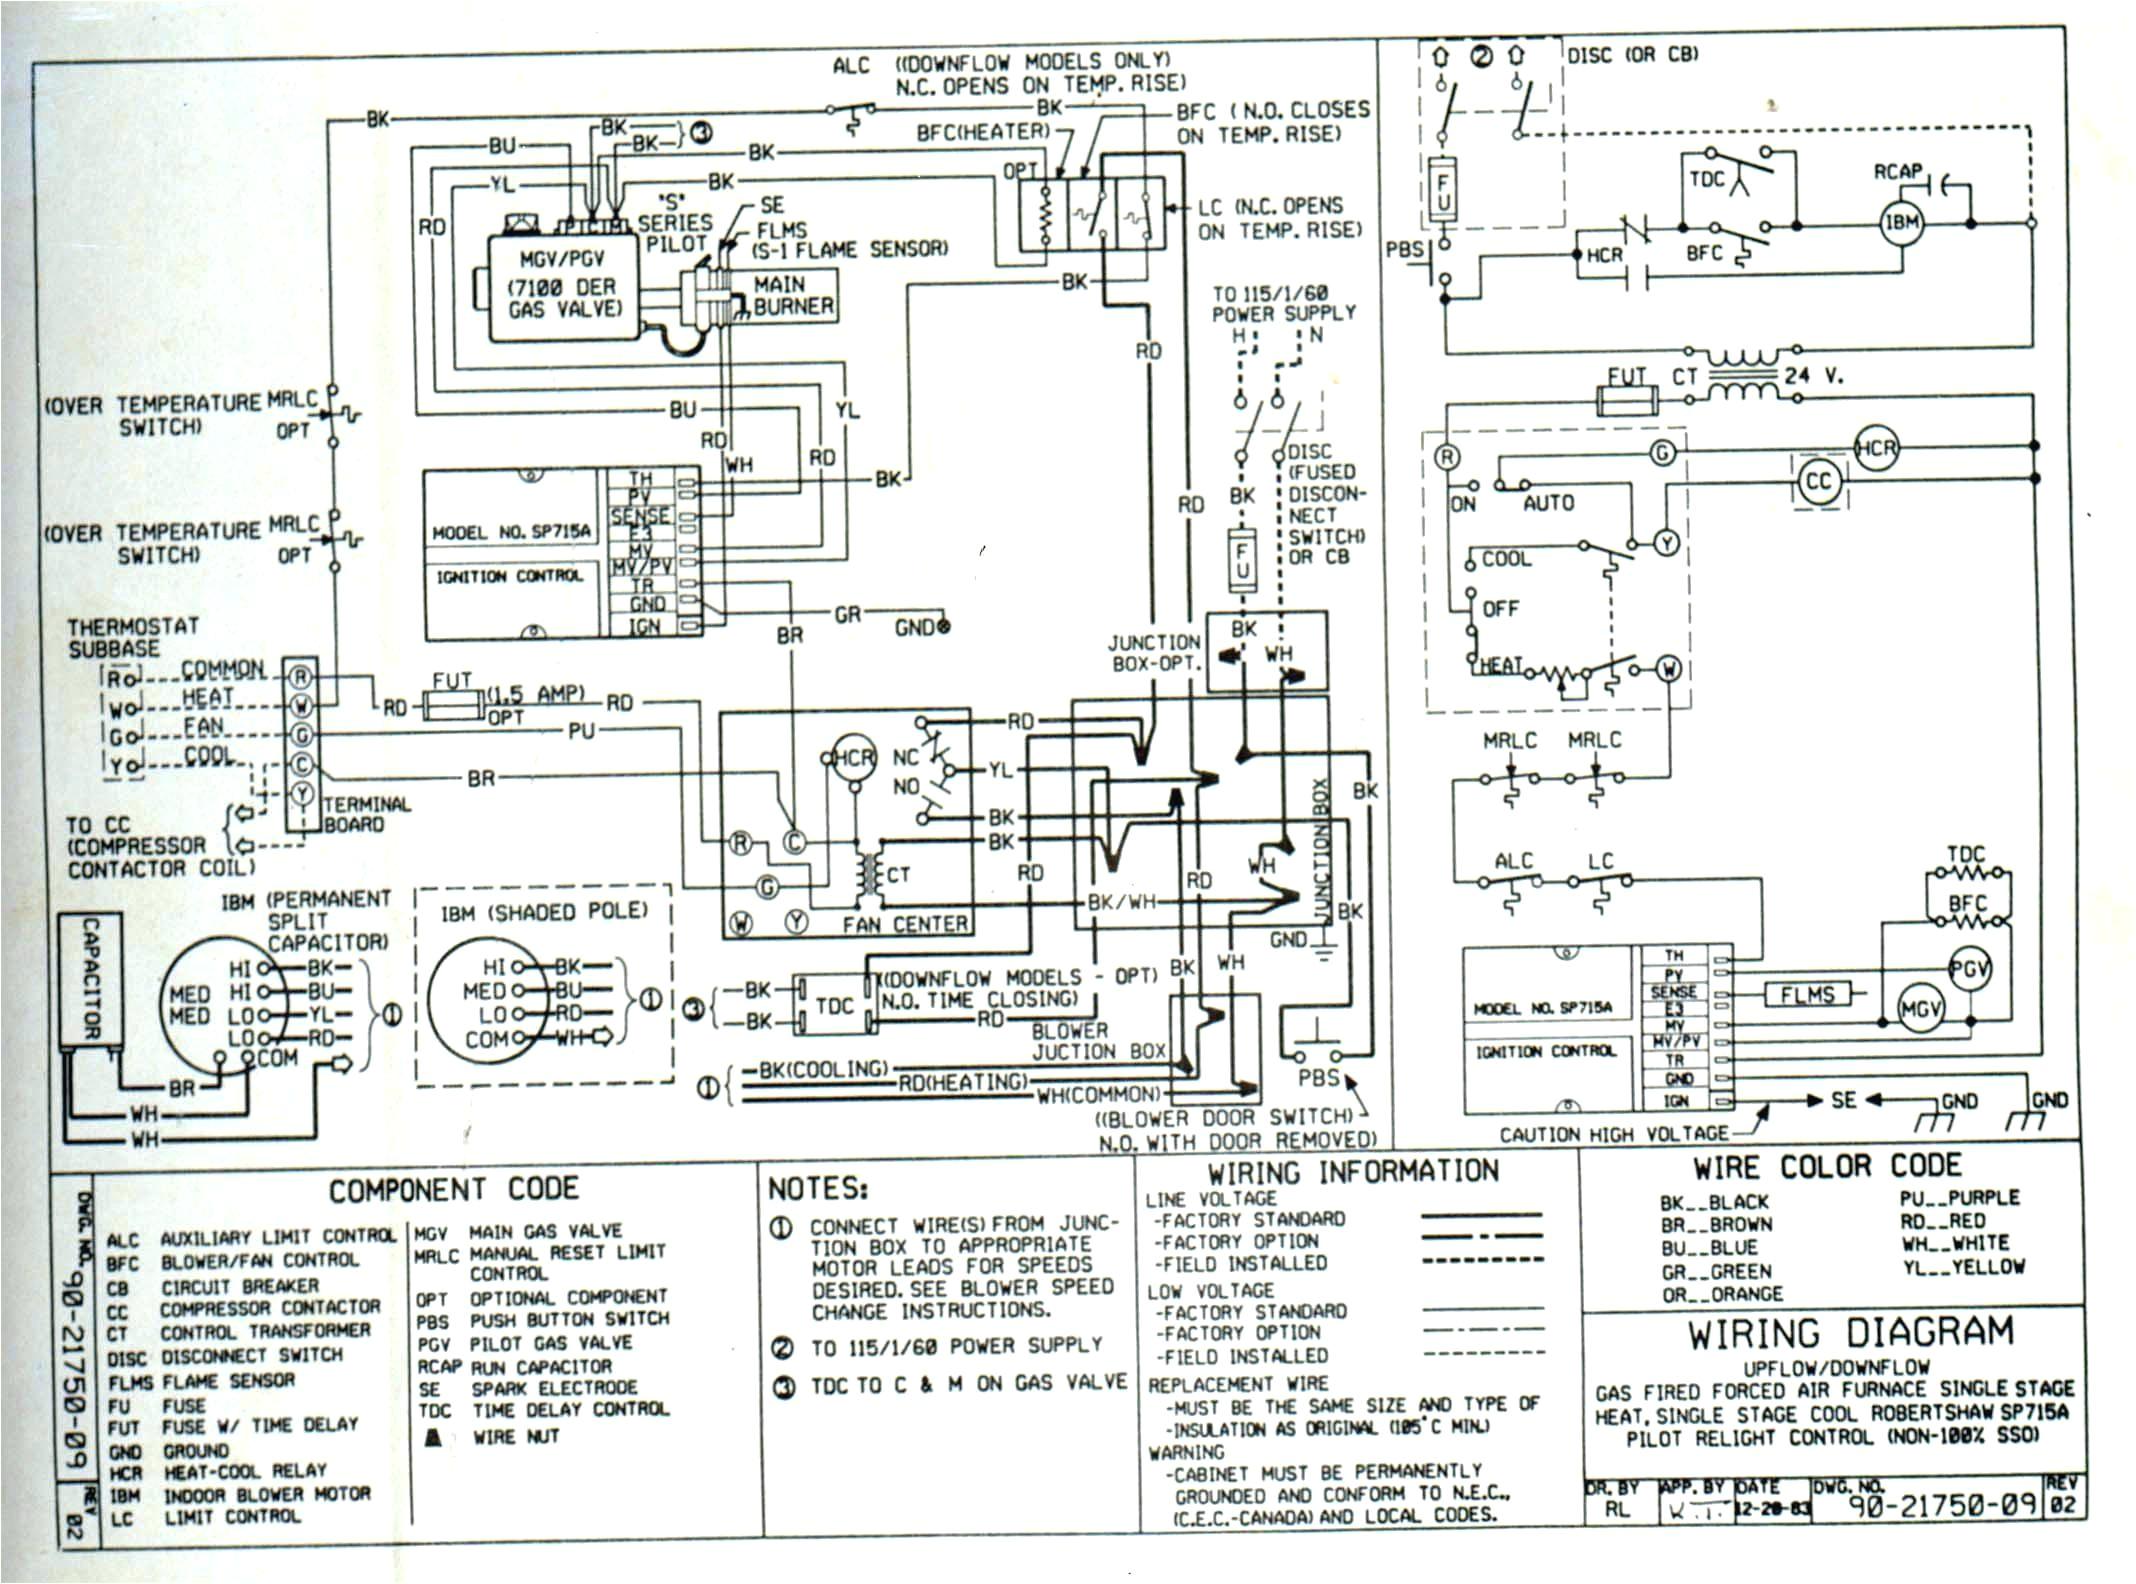 payne wiring diagram home wiring diagram wiring diagram payne ac unit payne wiring diagram wiring diagram